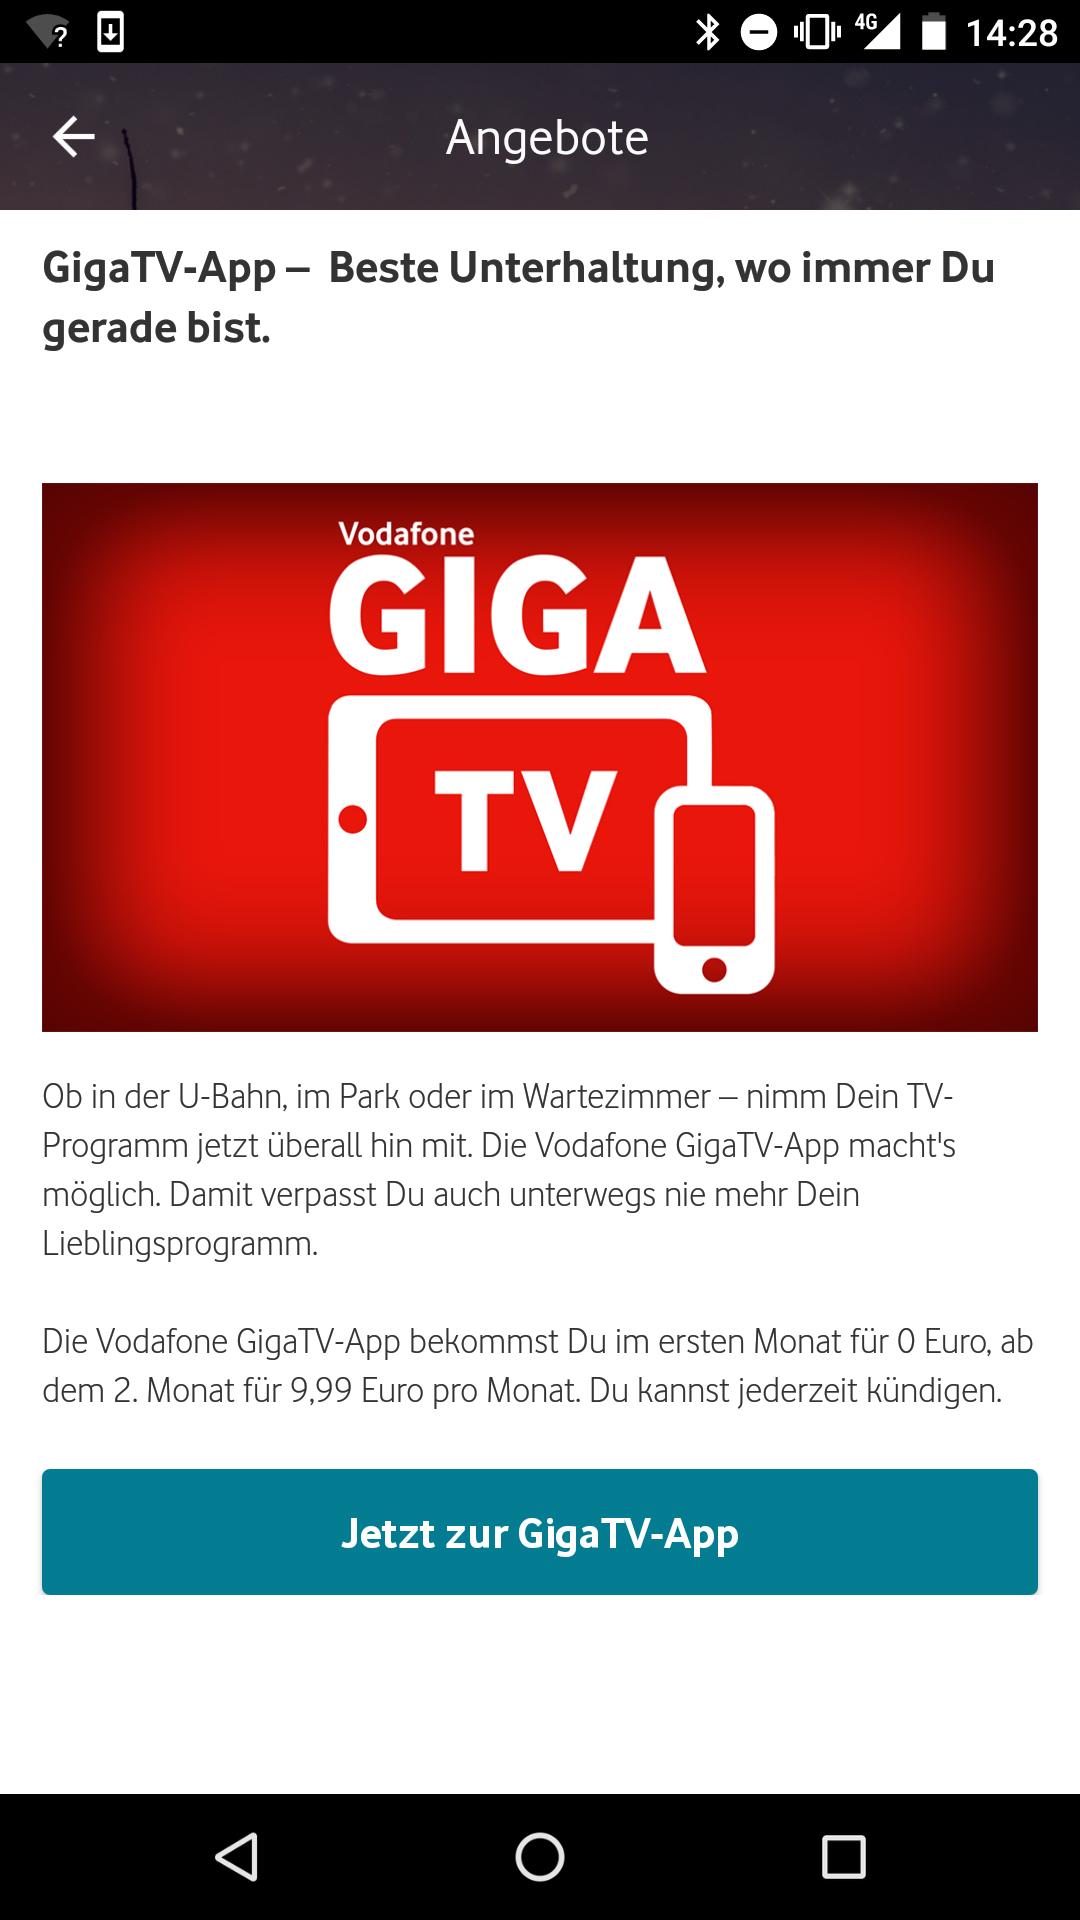 Vodafone GigaTV 1. Monat gratis (Kündigung notwendig)